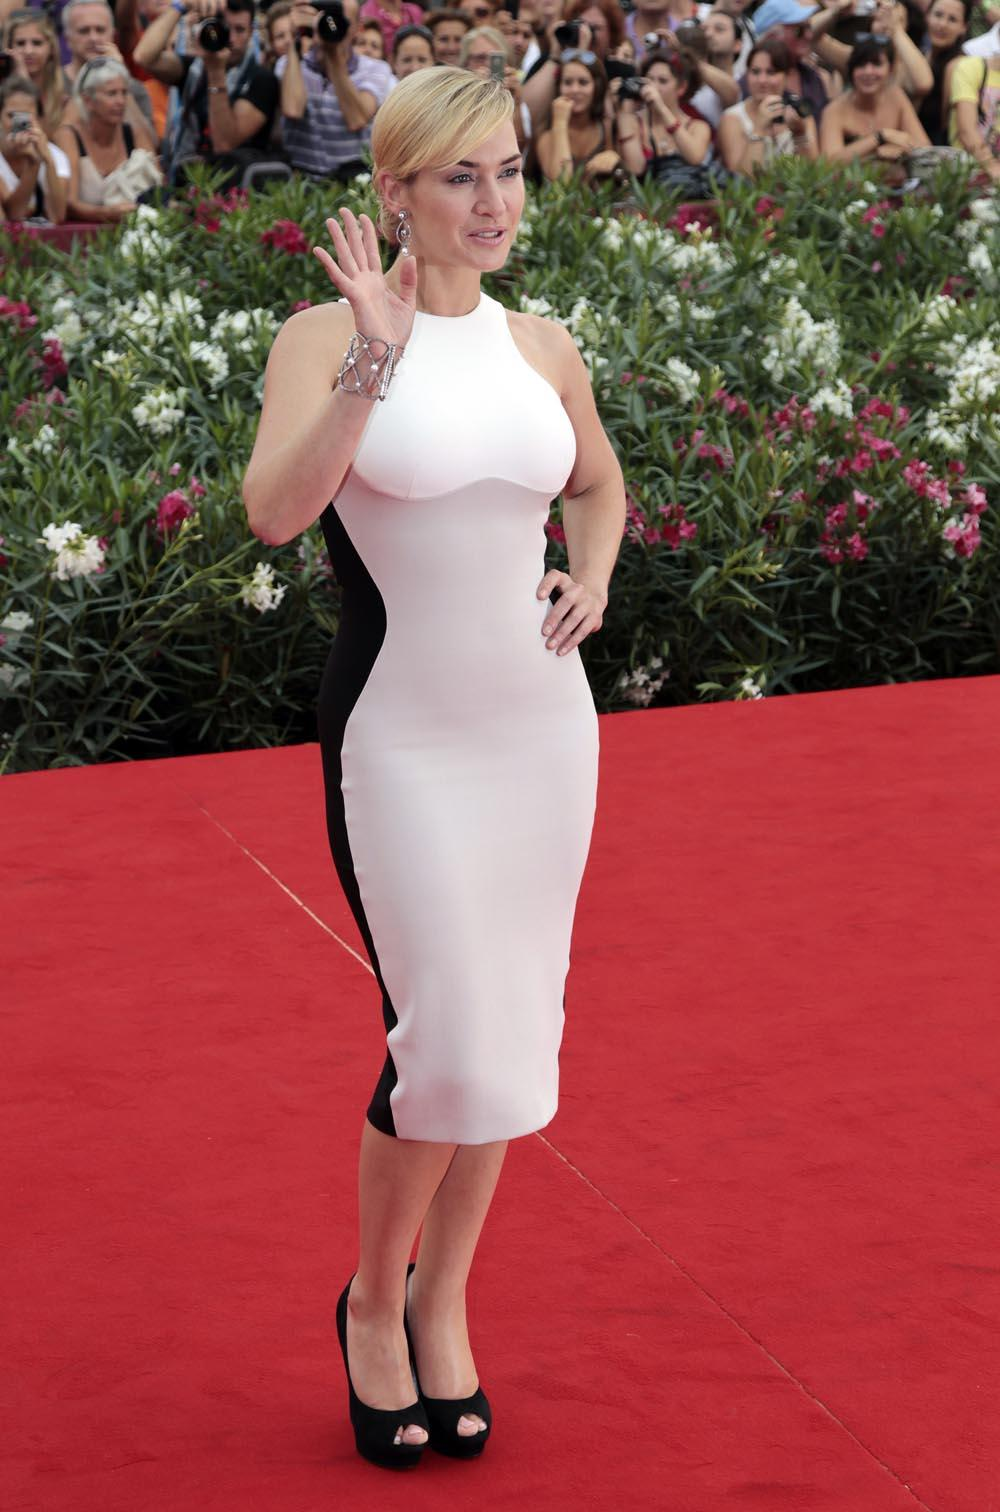 kate winslet looks thin in color block stella mccartney dress